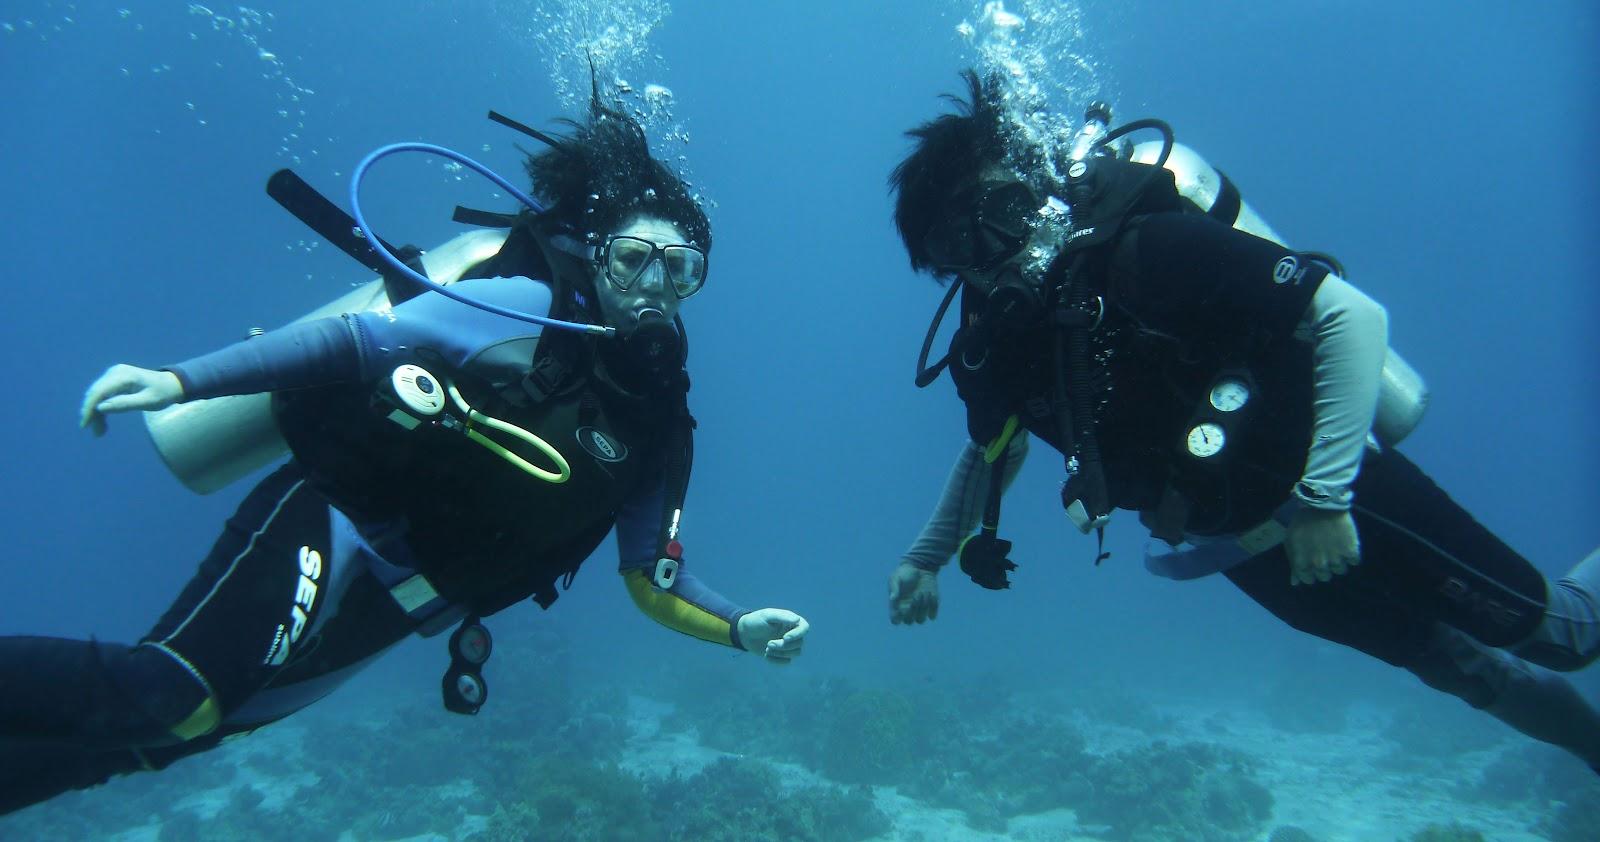 Berny eats the world jordan spring 2012 for Aqaba dive